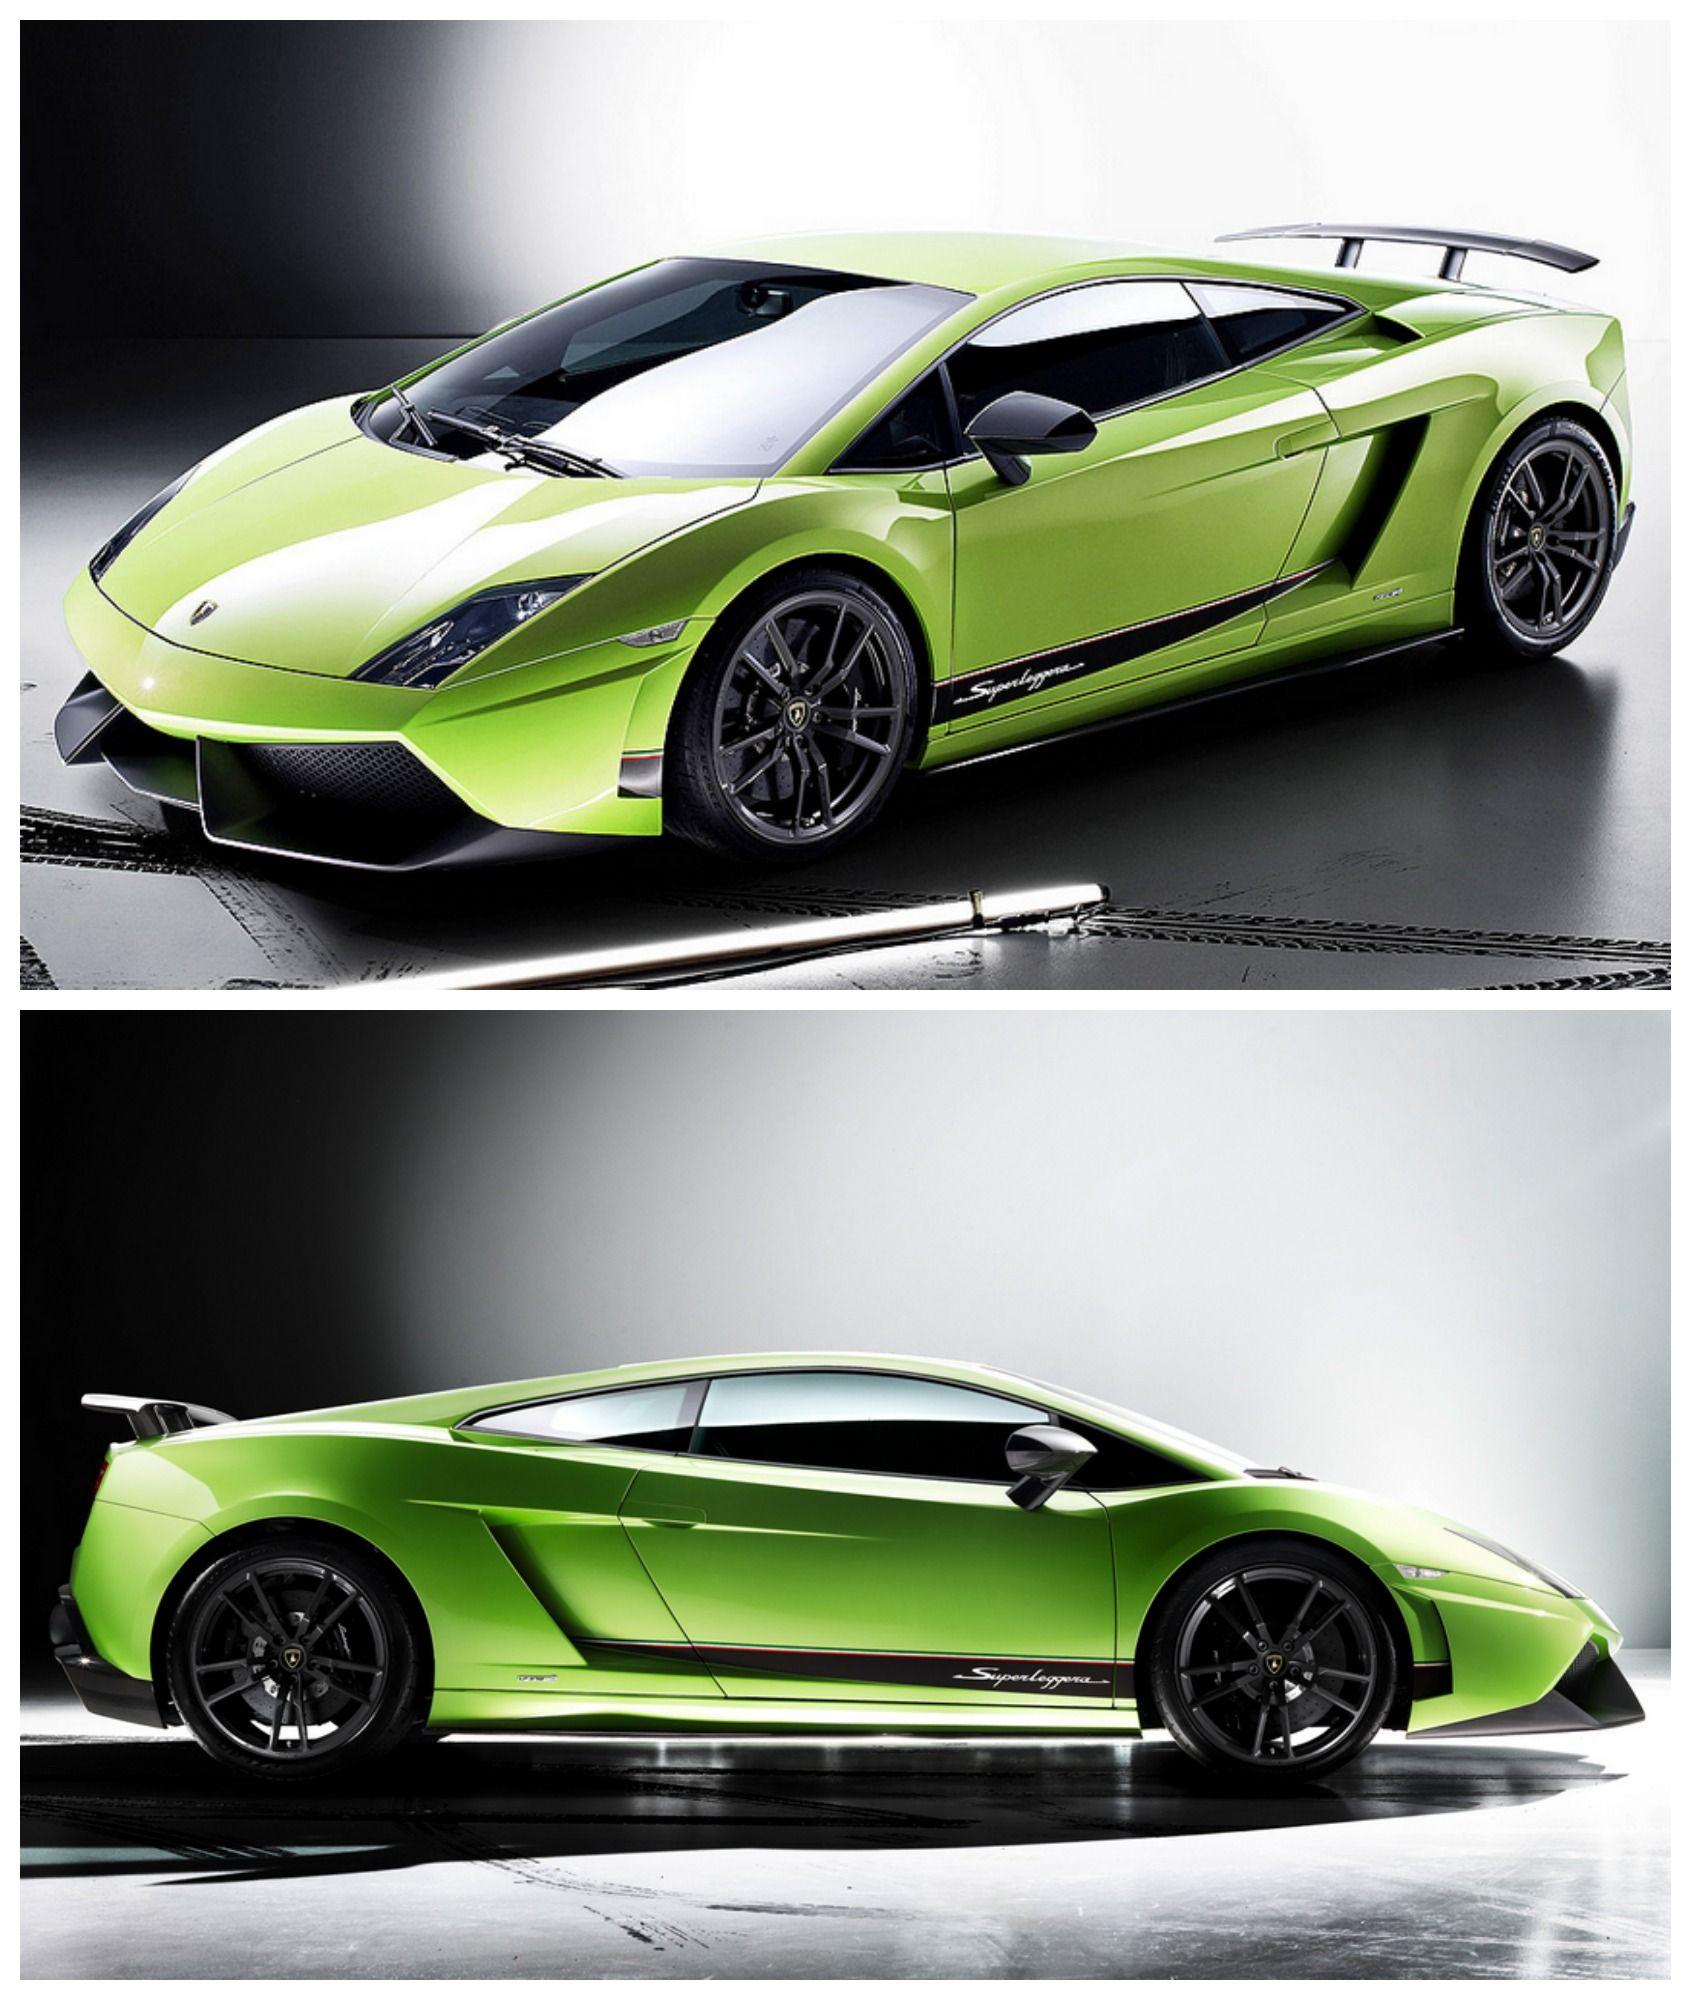 Insane Green Lamborghini Gallardo Superleggera